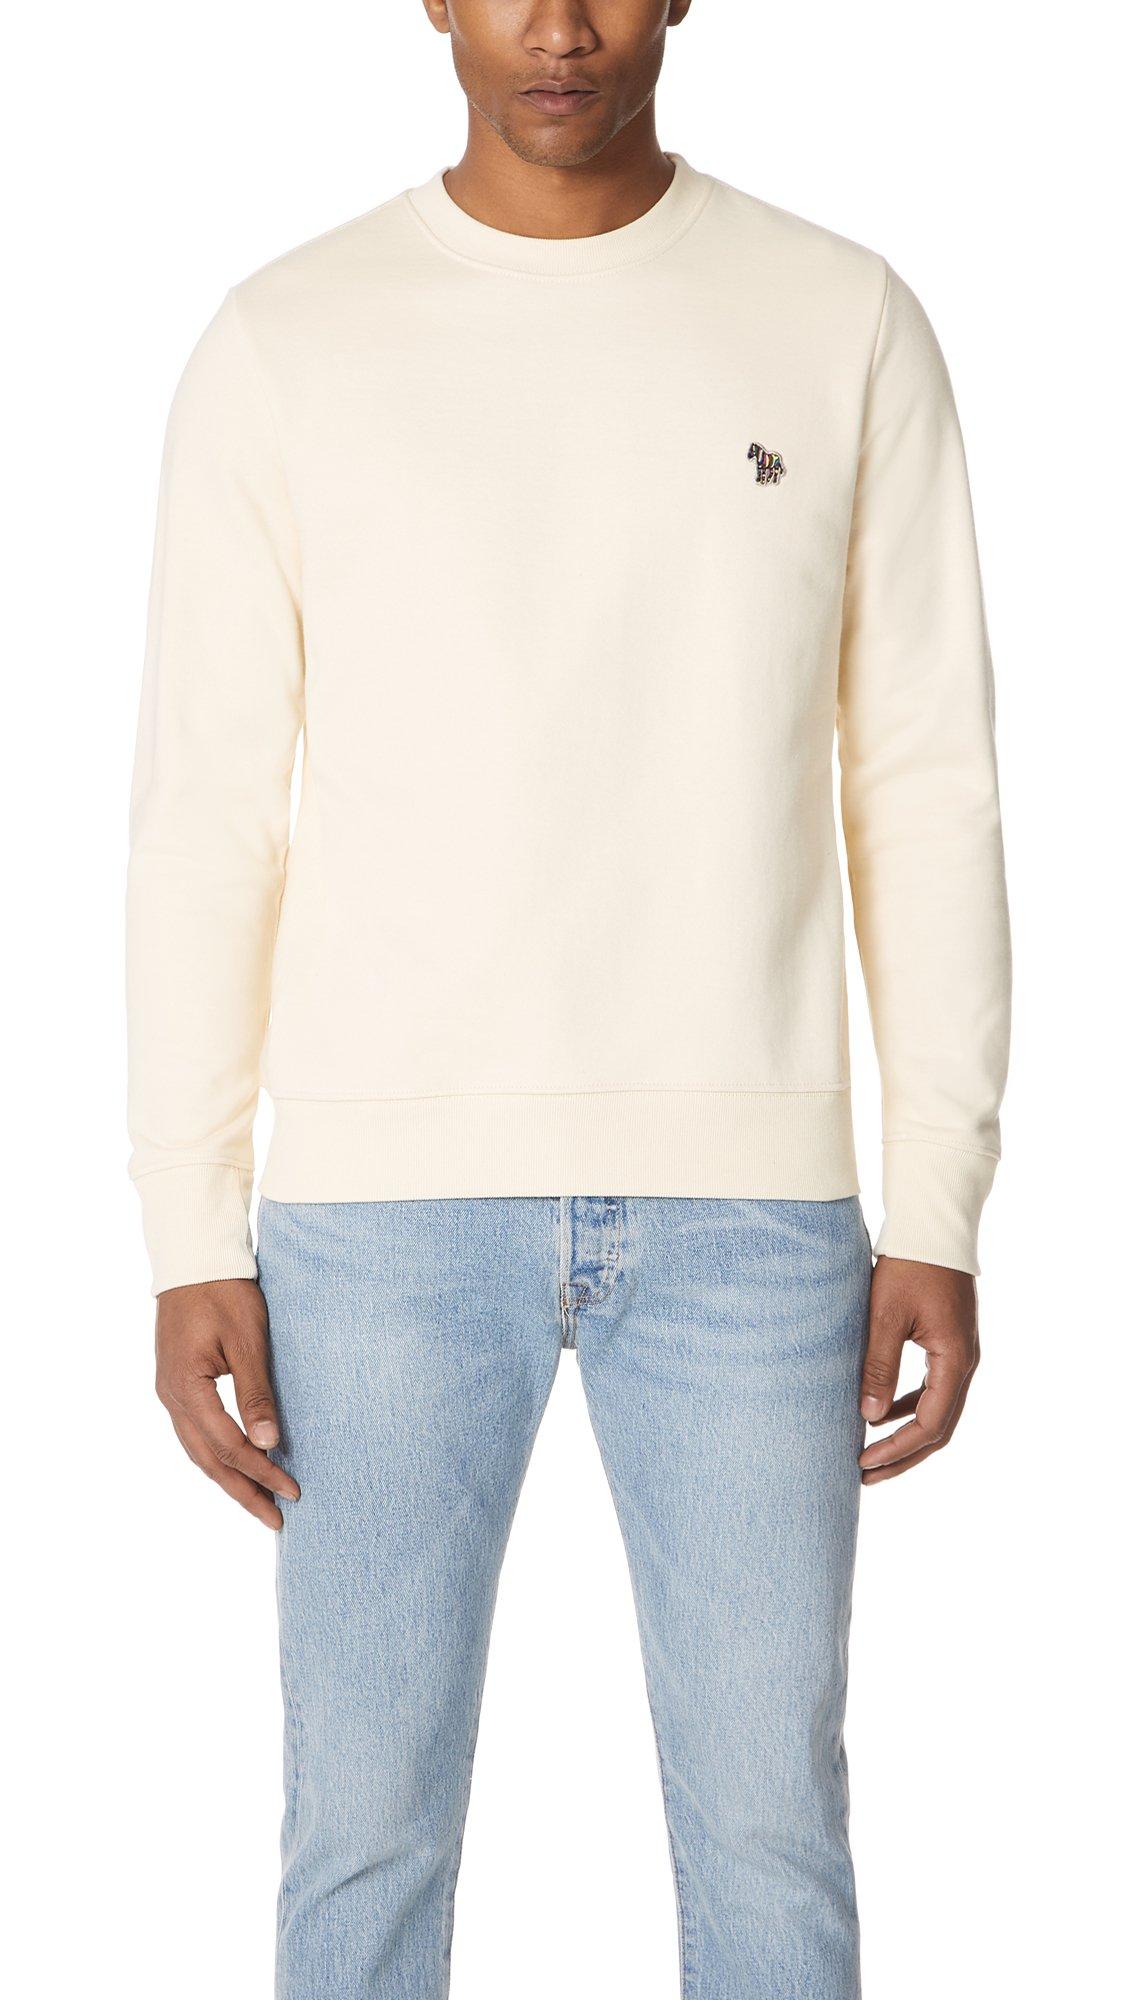 PS by Paul Smith Men's Crew Neck Zebra Sweatshirt, Off White, Medium